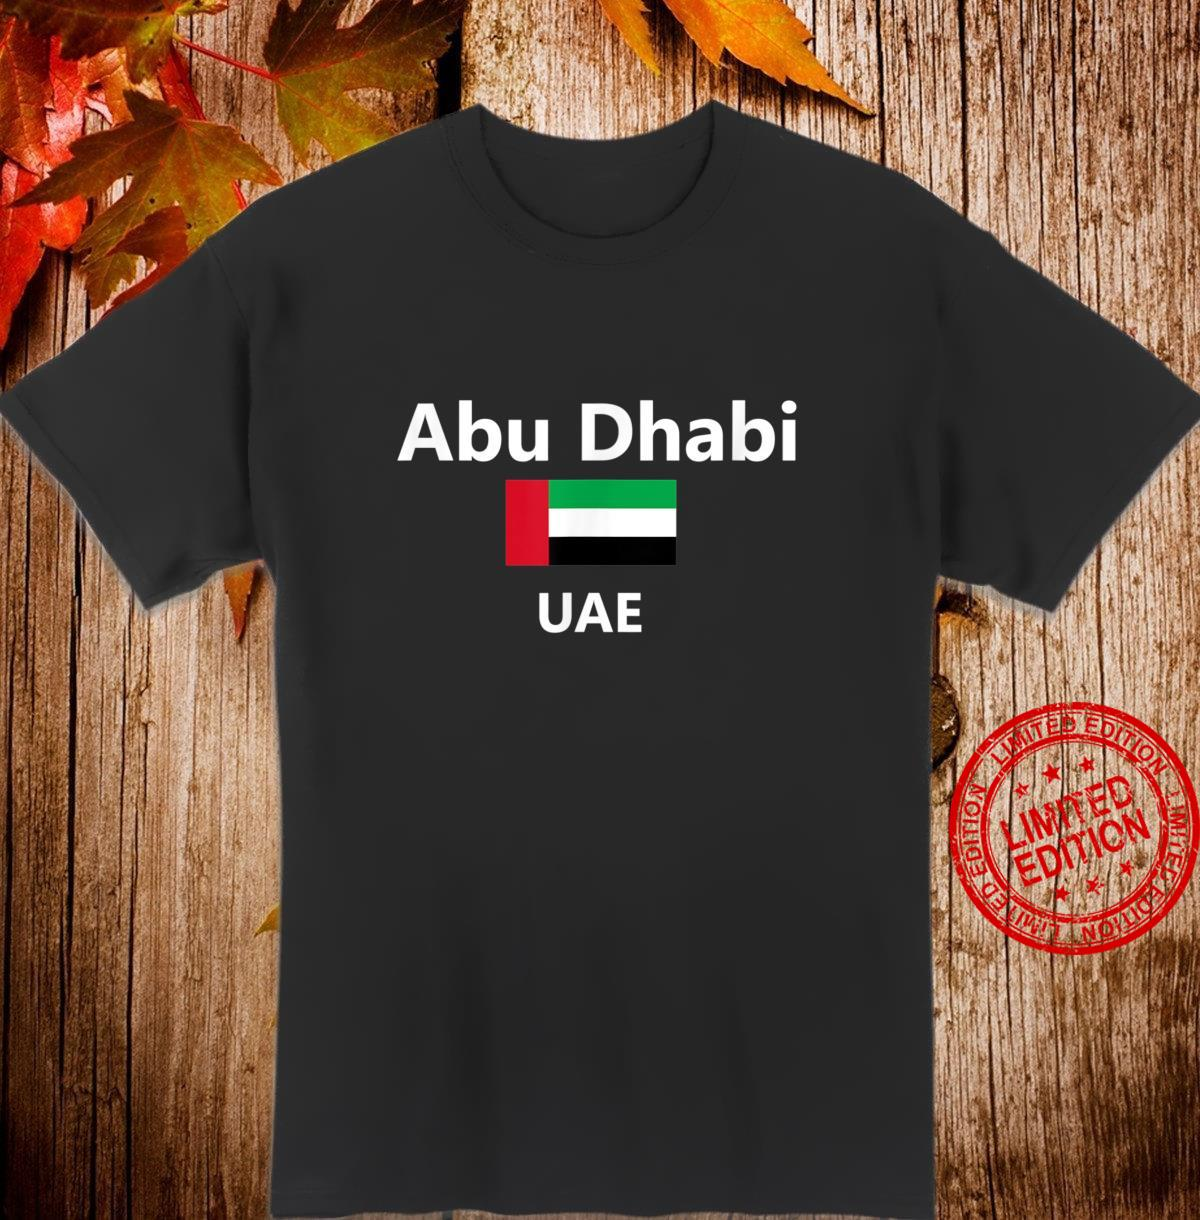 Abu Dhabi United Arab Emirates UAE Flag Country Shirt